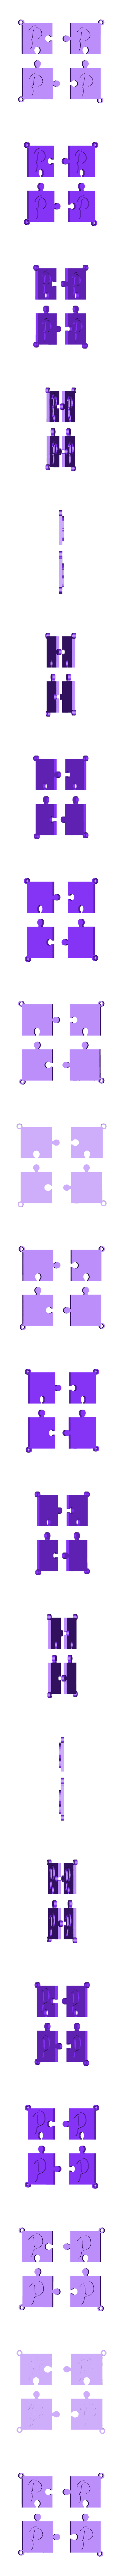 puzzle p.stl Download STL file puzzle key ring • 3D printing design, catf3d